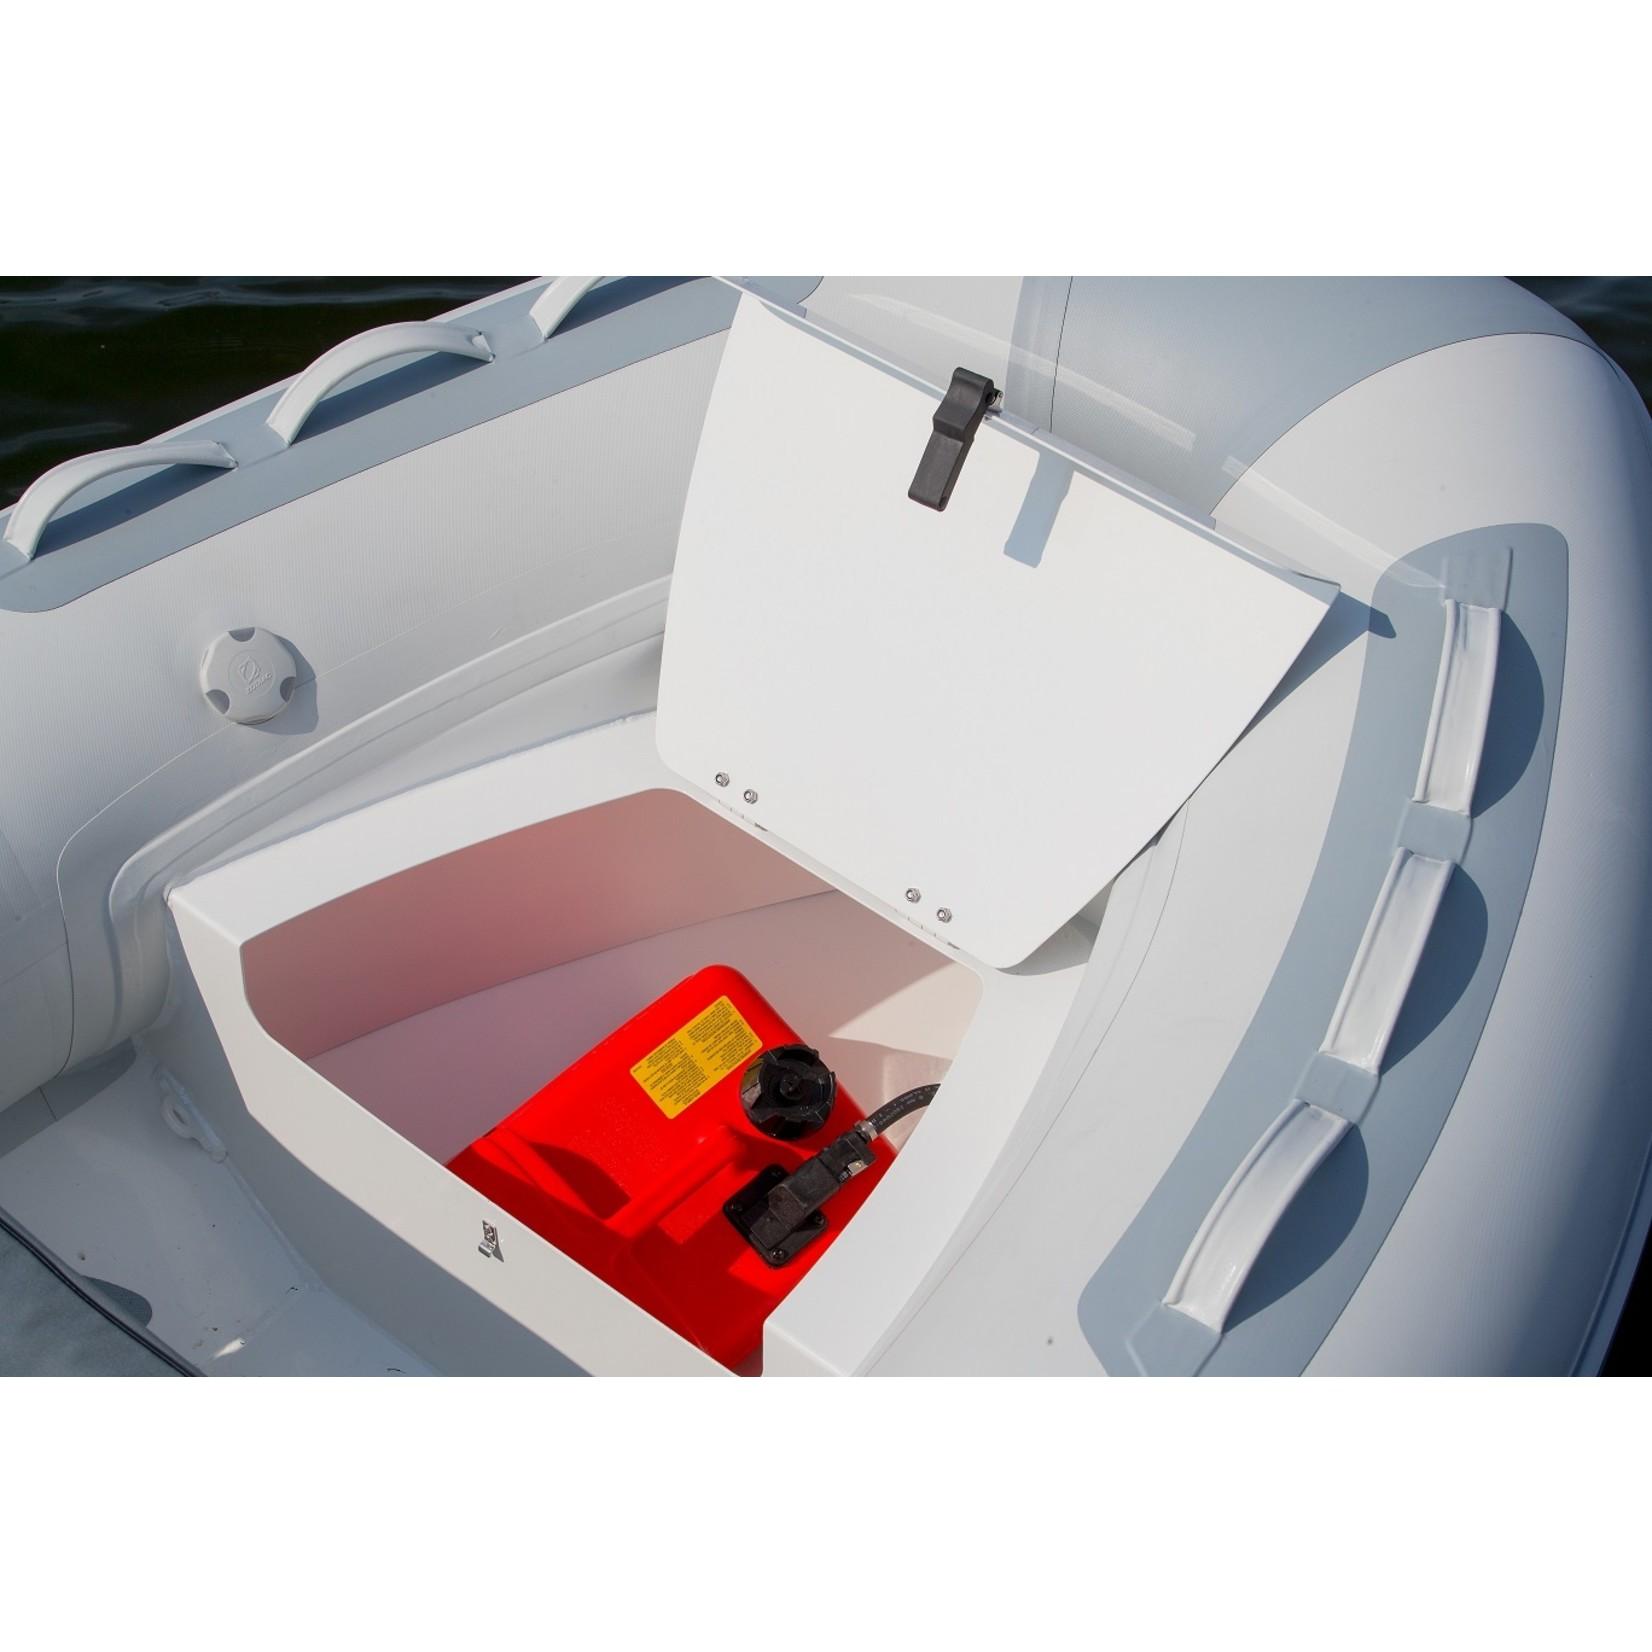 Zodiac Cadet 300 DL ALU RIB - Deck & Locker